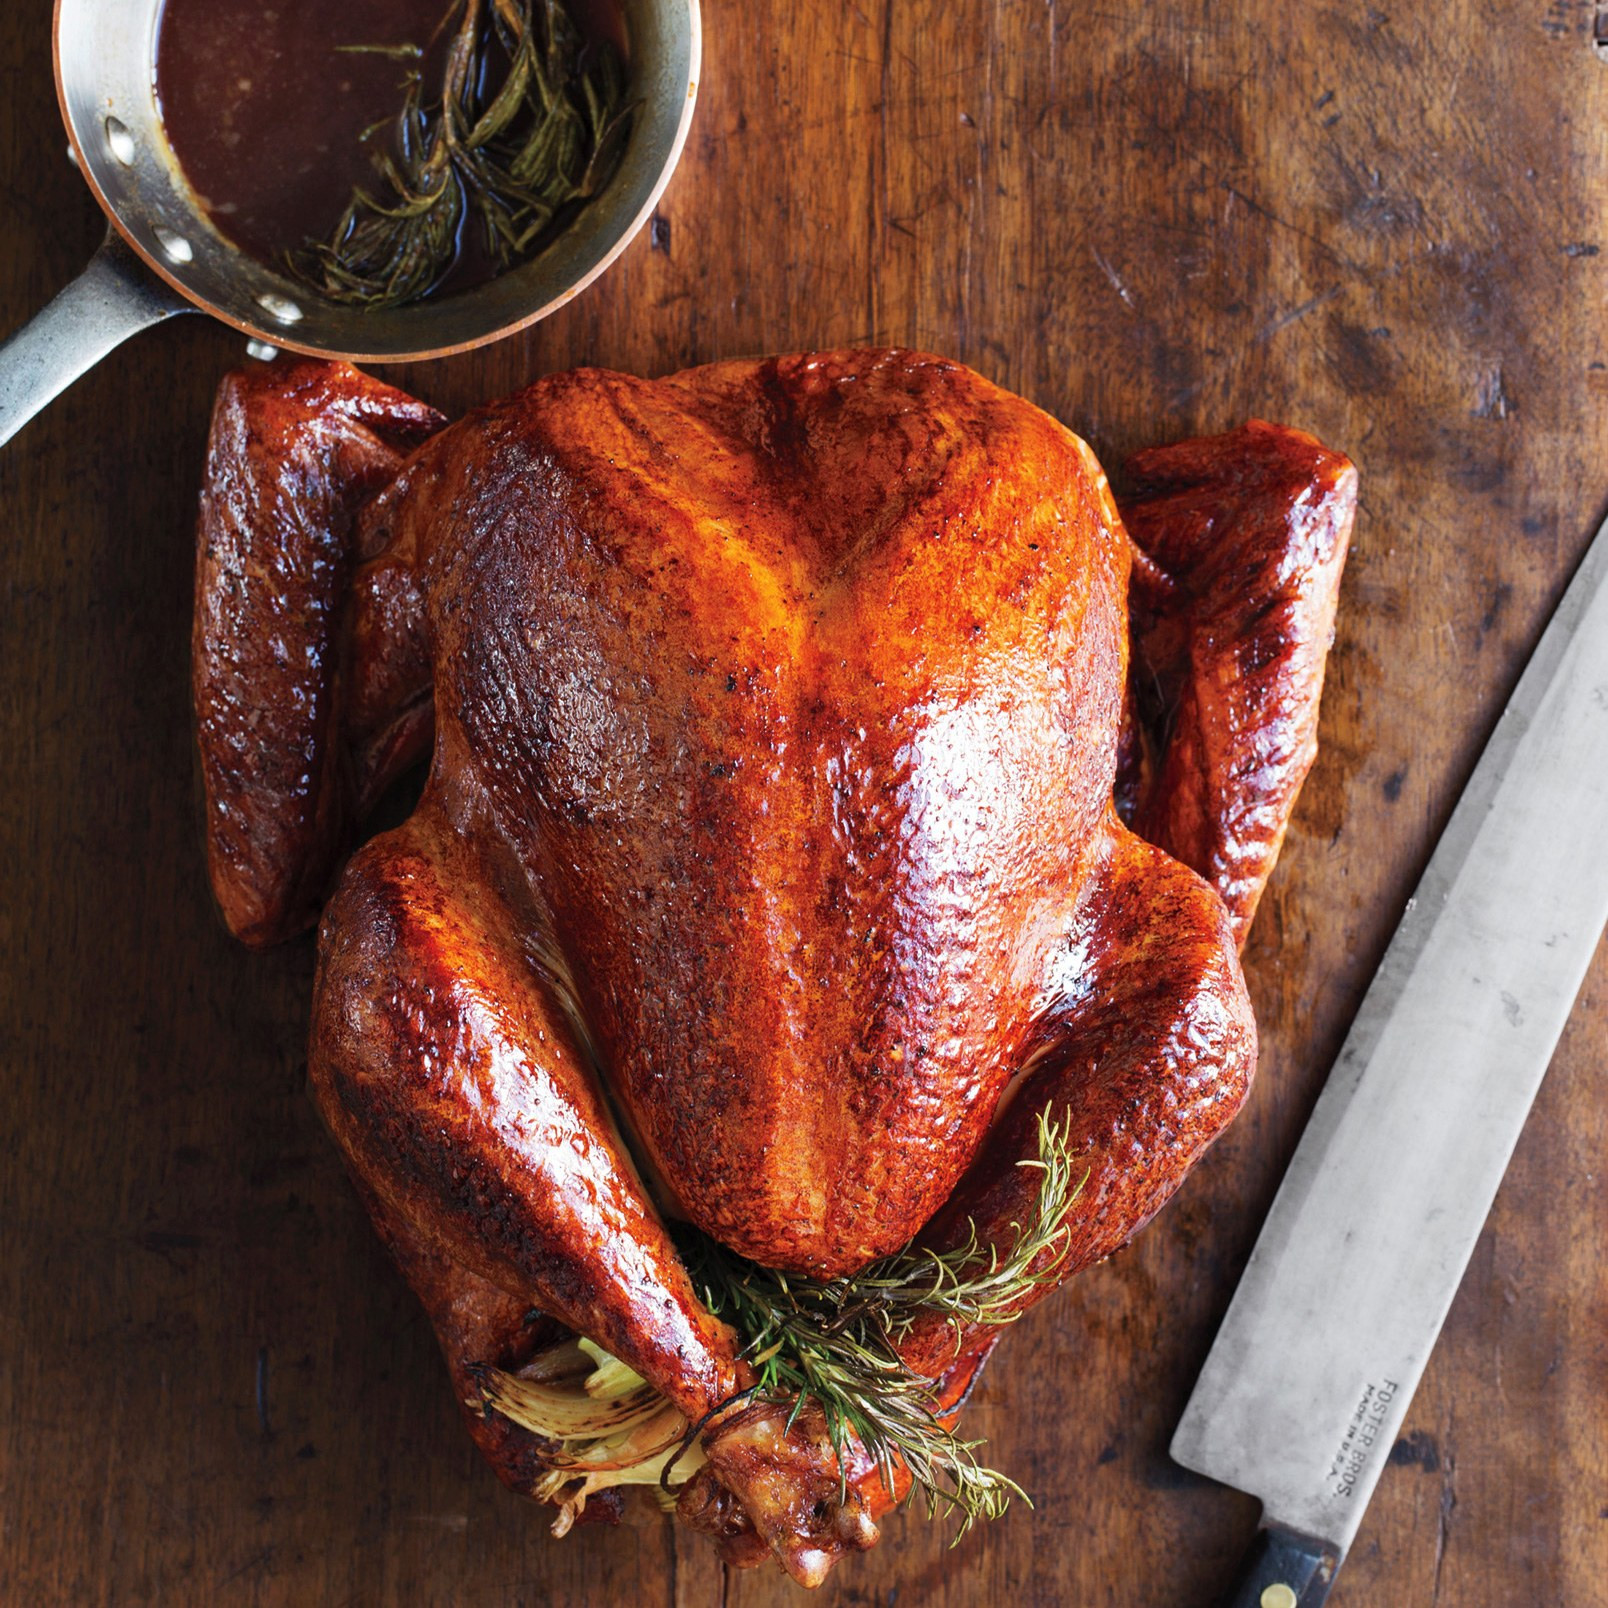 Roasted Turkey Recipes Thanksgiving  A Simple Roast Turkey recipe